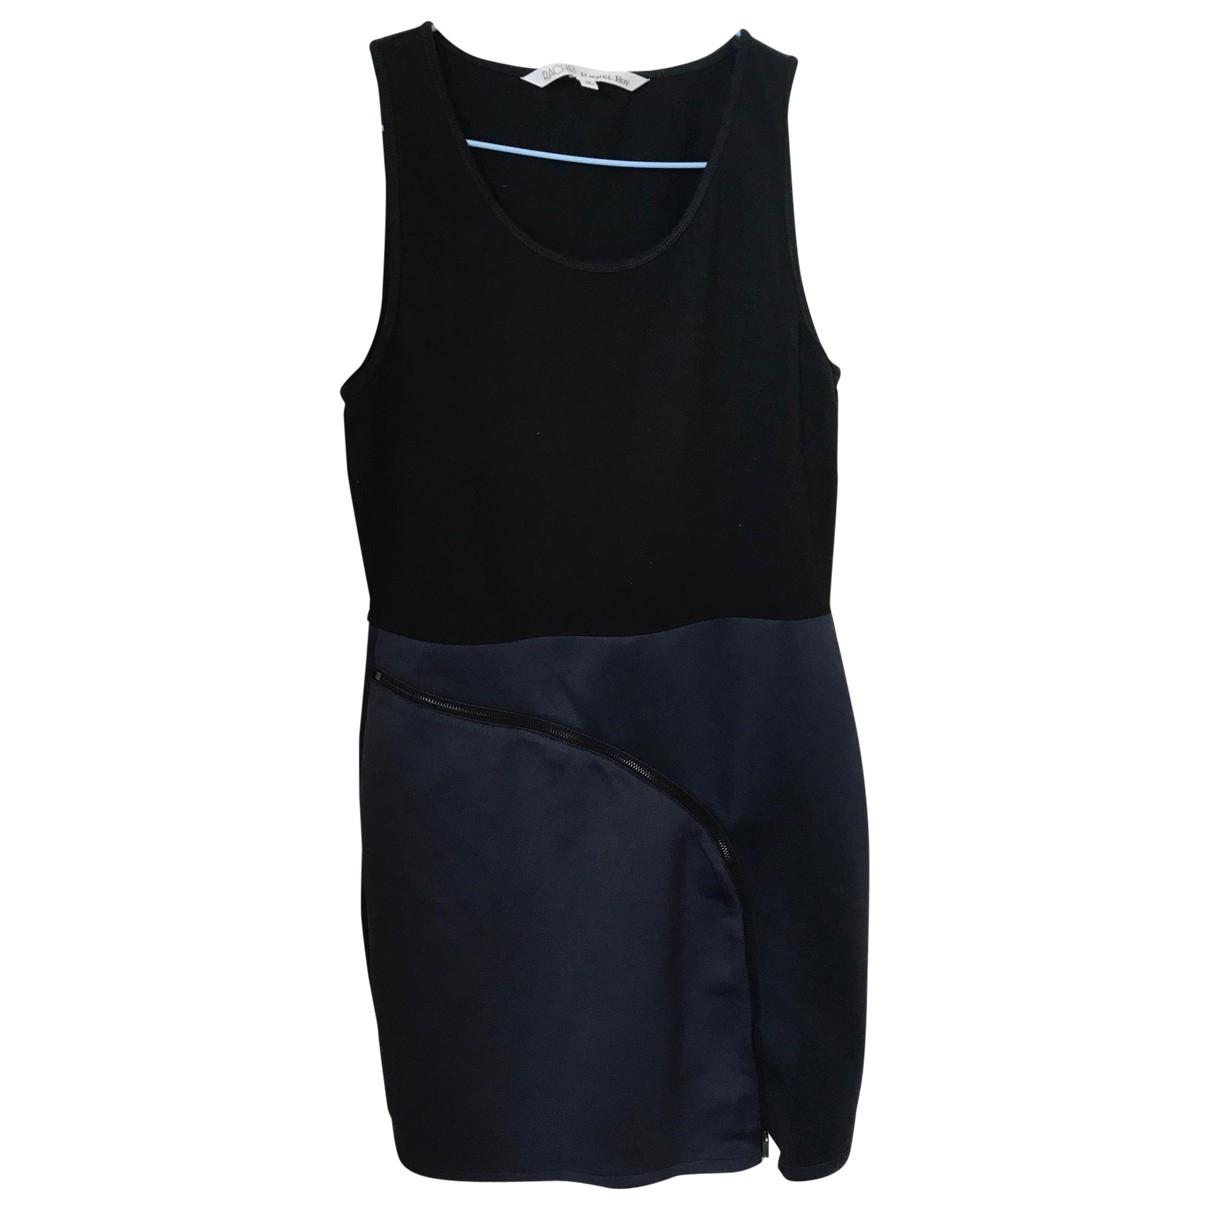 Rachel Roy \N Navy dress for Women M International